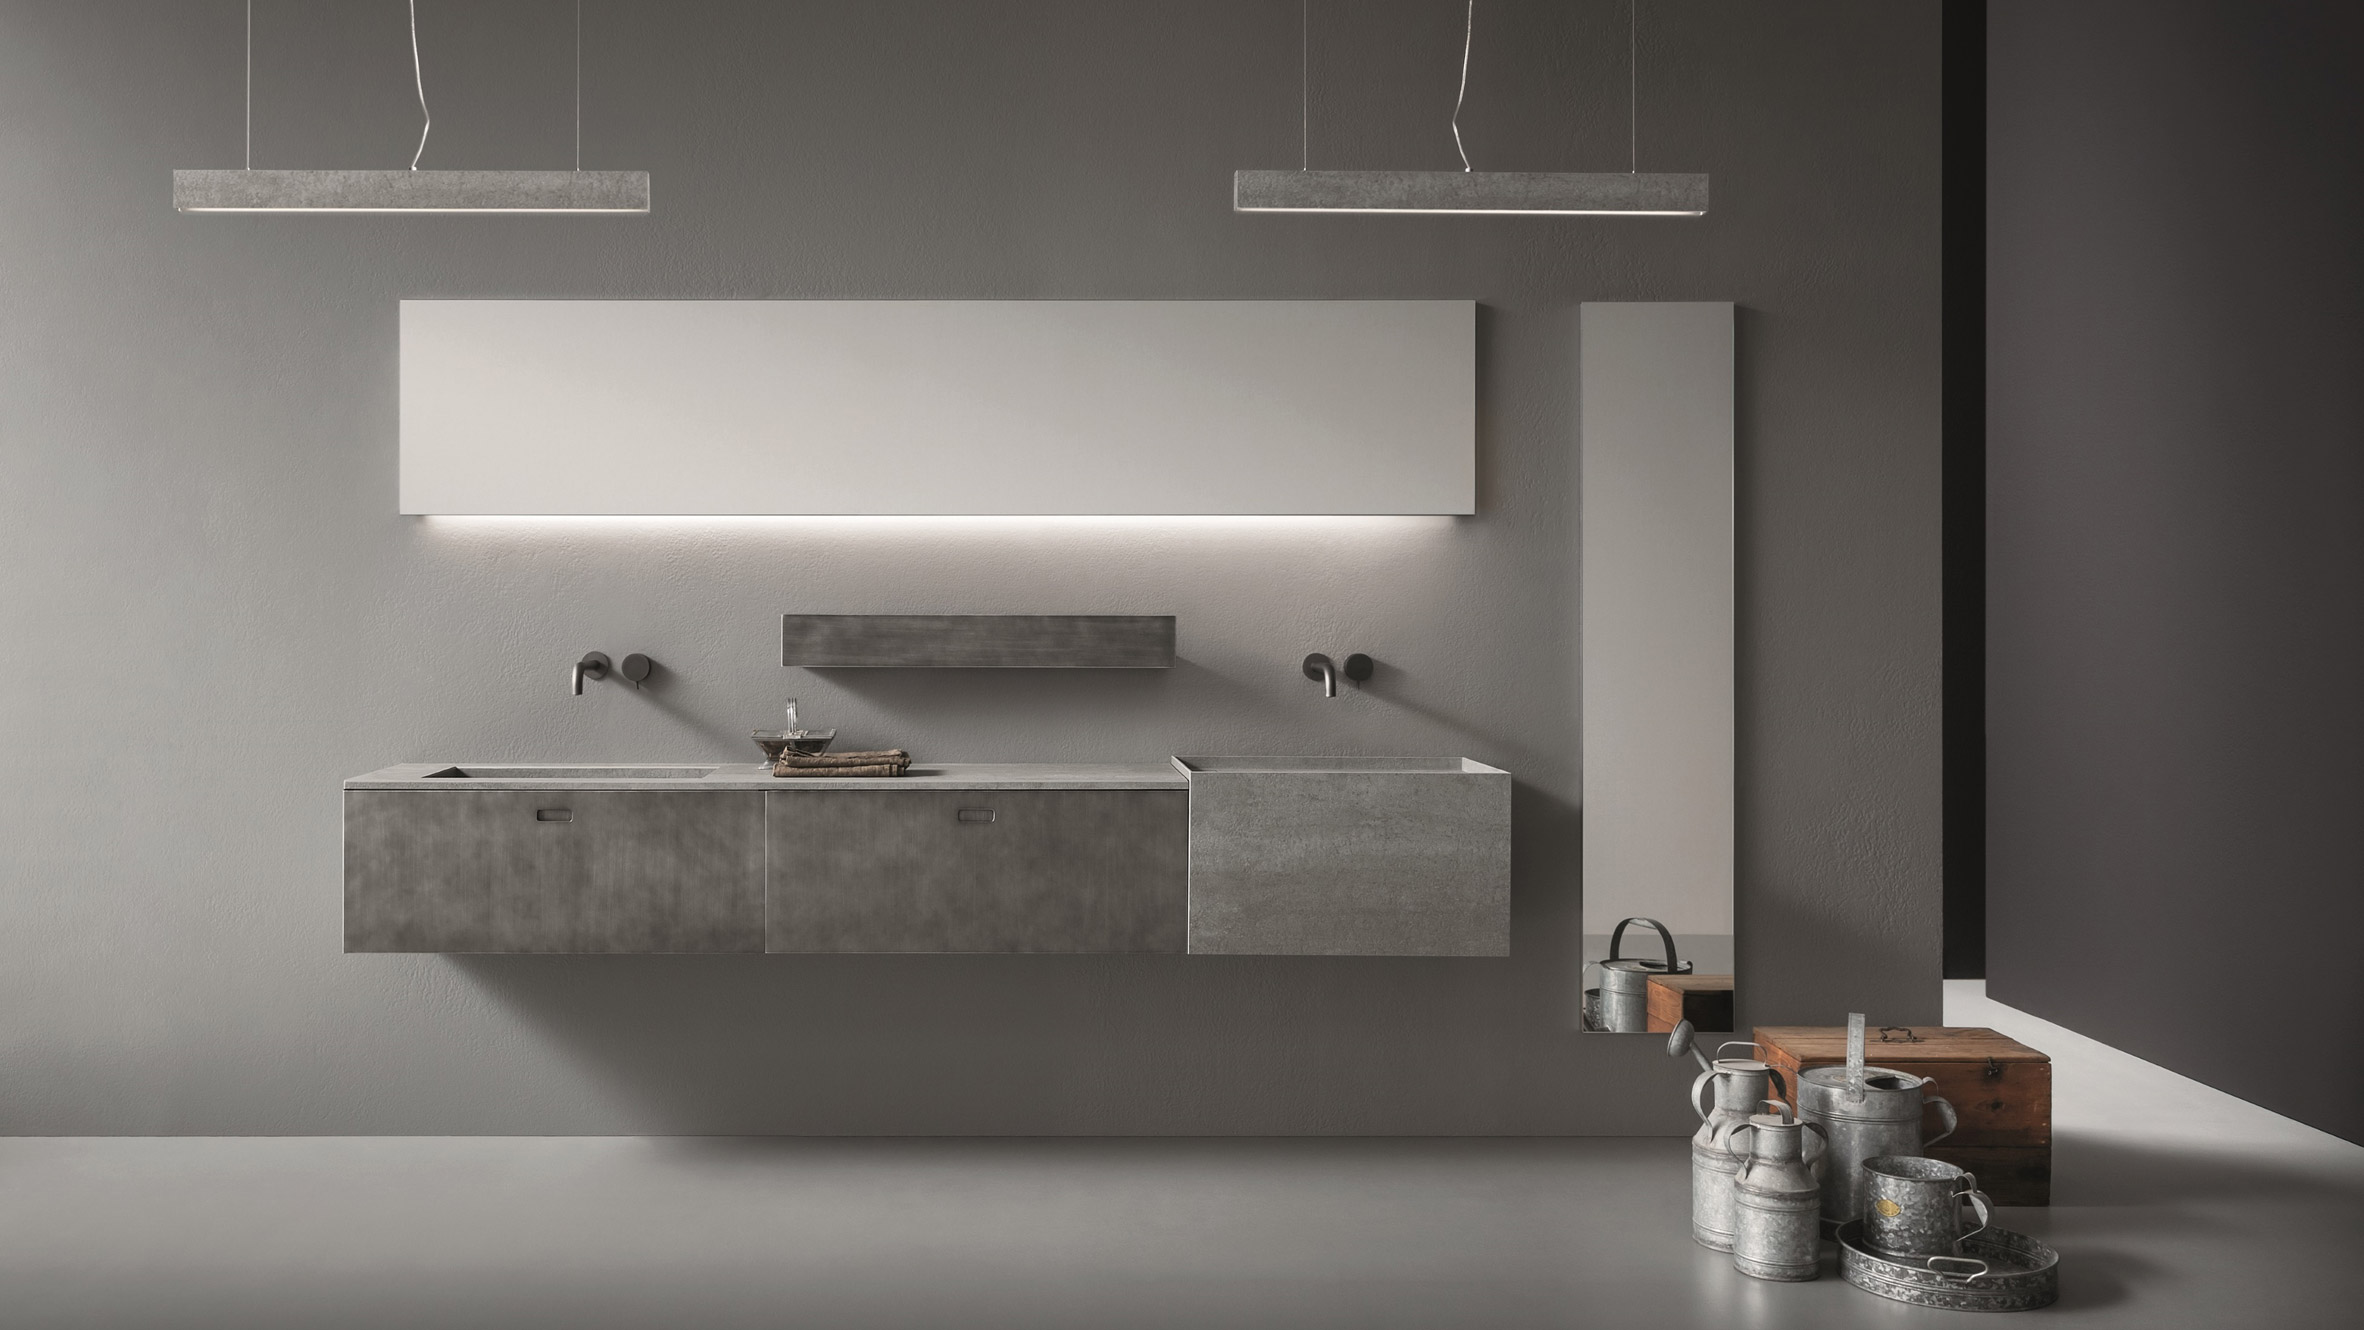 Framed Shower Screens – A Futuristic View to A Modern-Day Bathroom